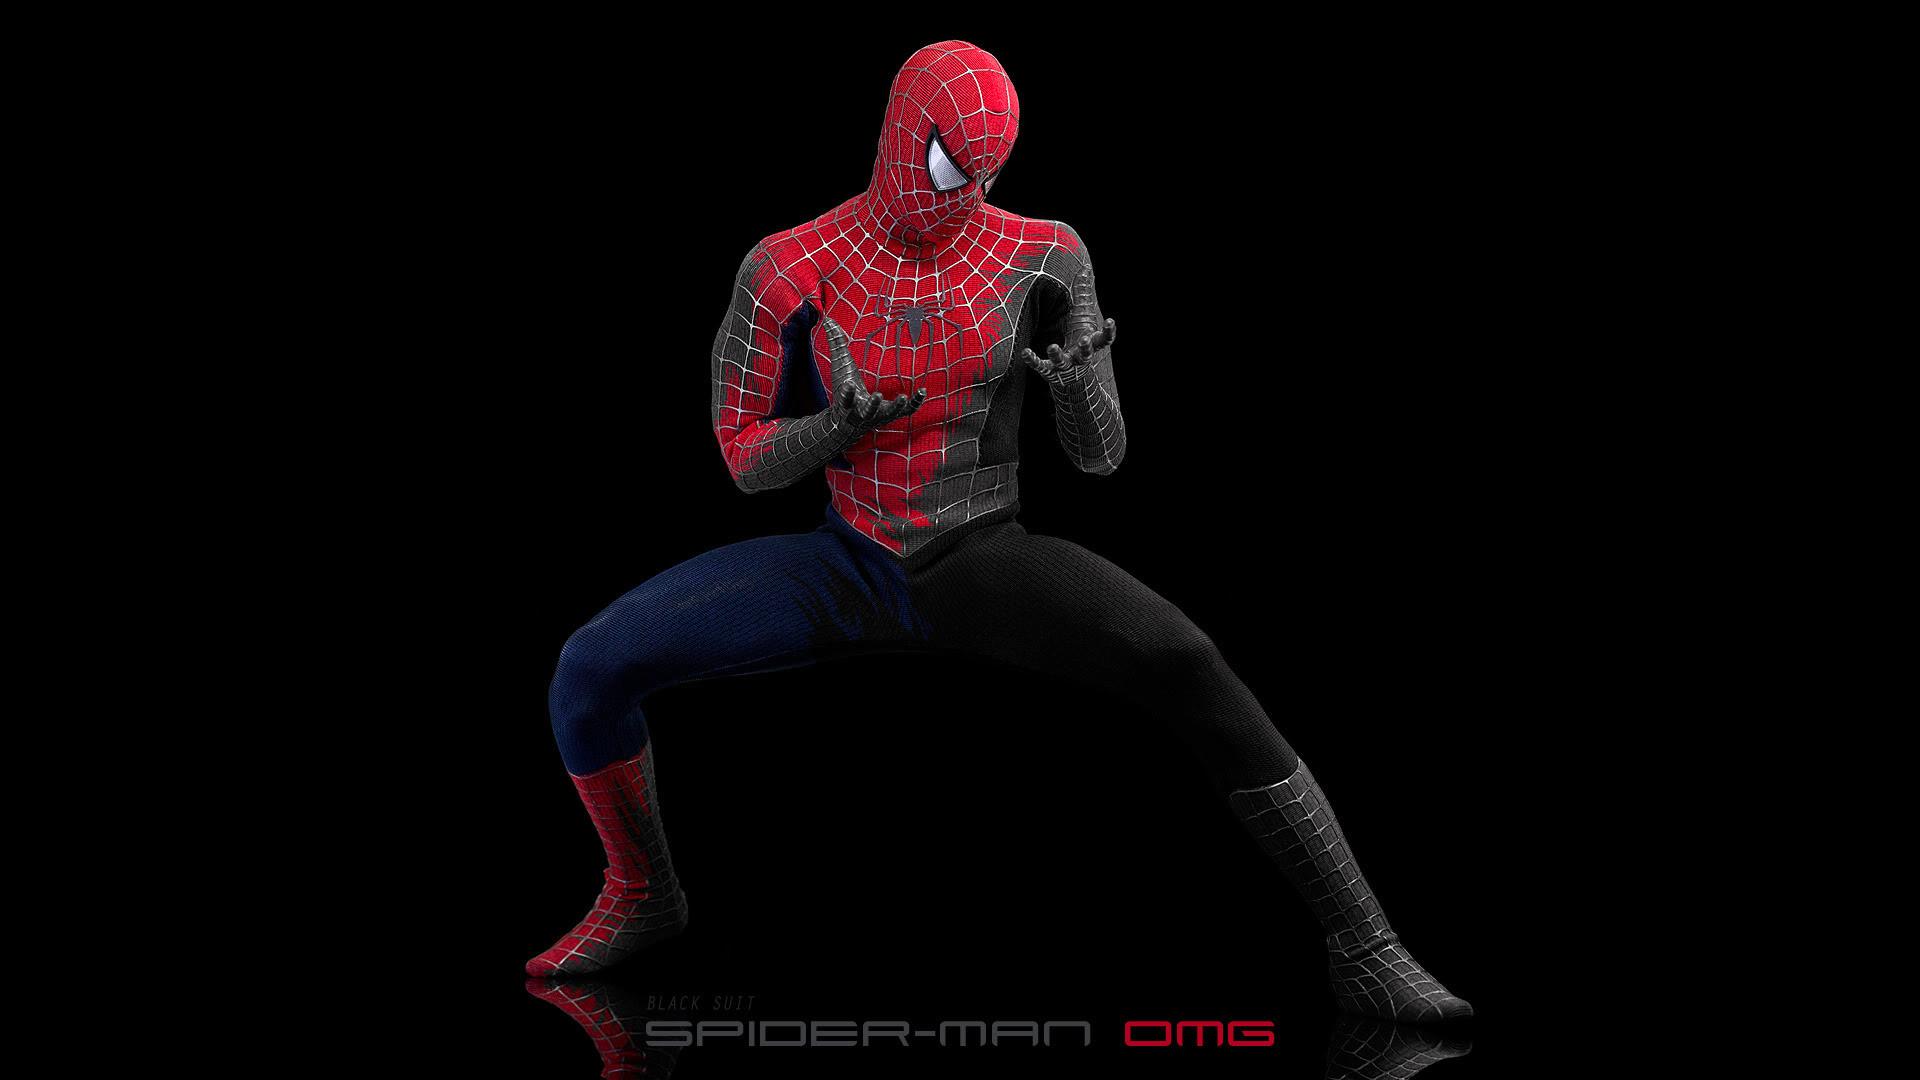 Black Suit Spiderman Wallpaper (75+ images)